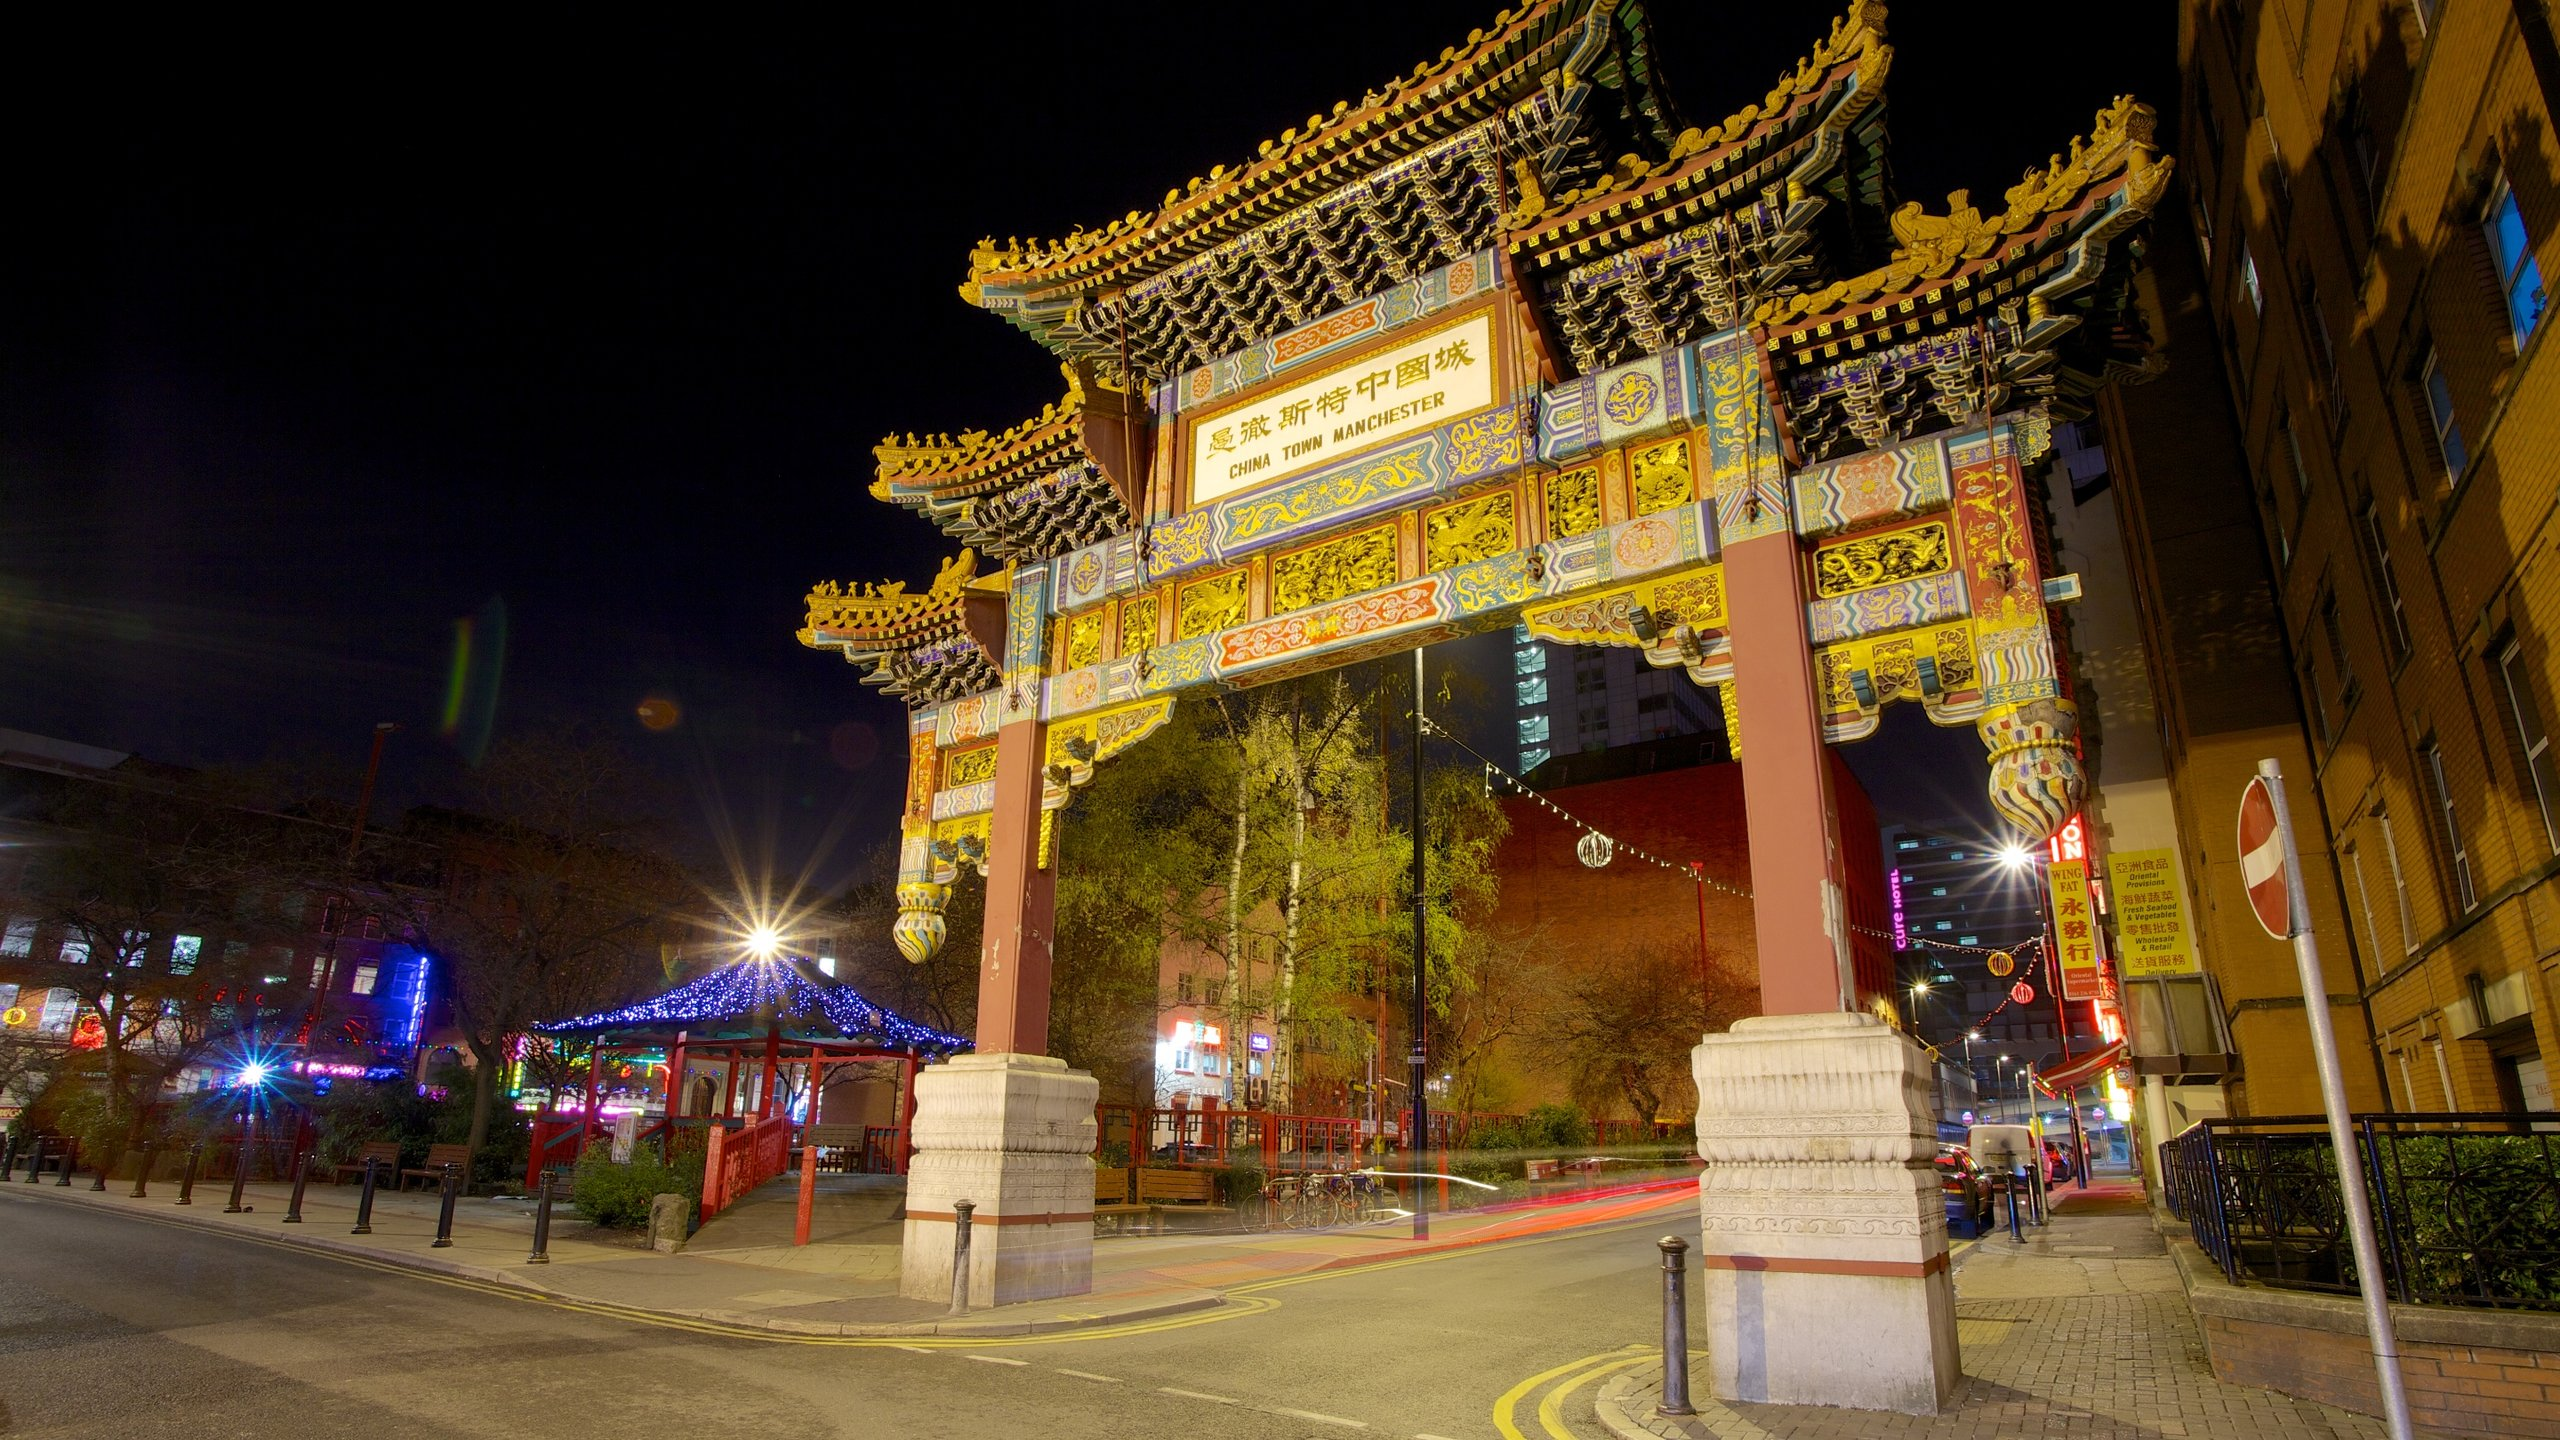 Chinatown, Manchester, England, United Kingdom